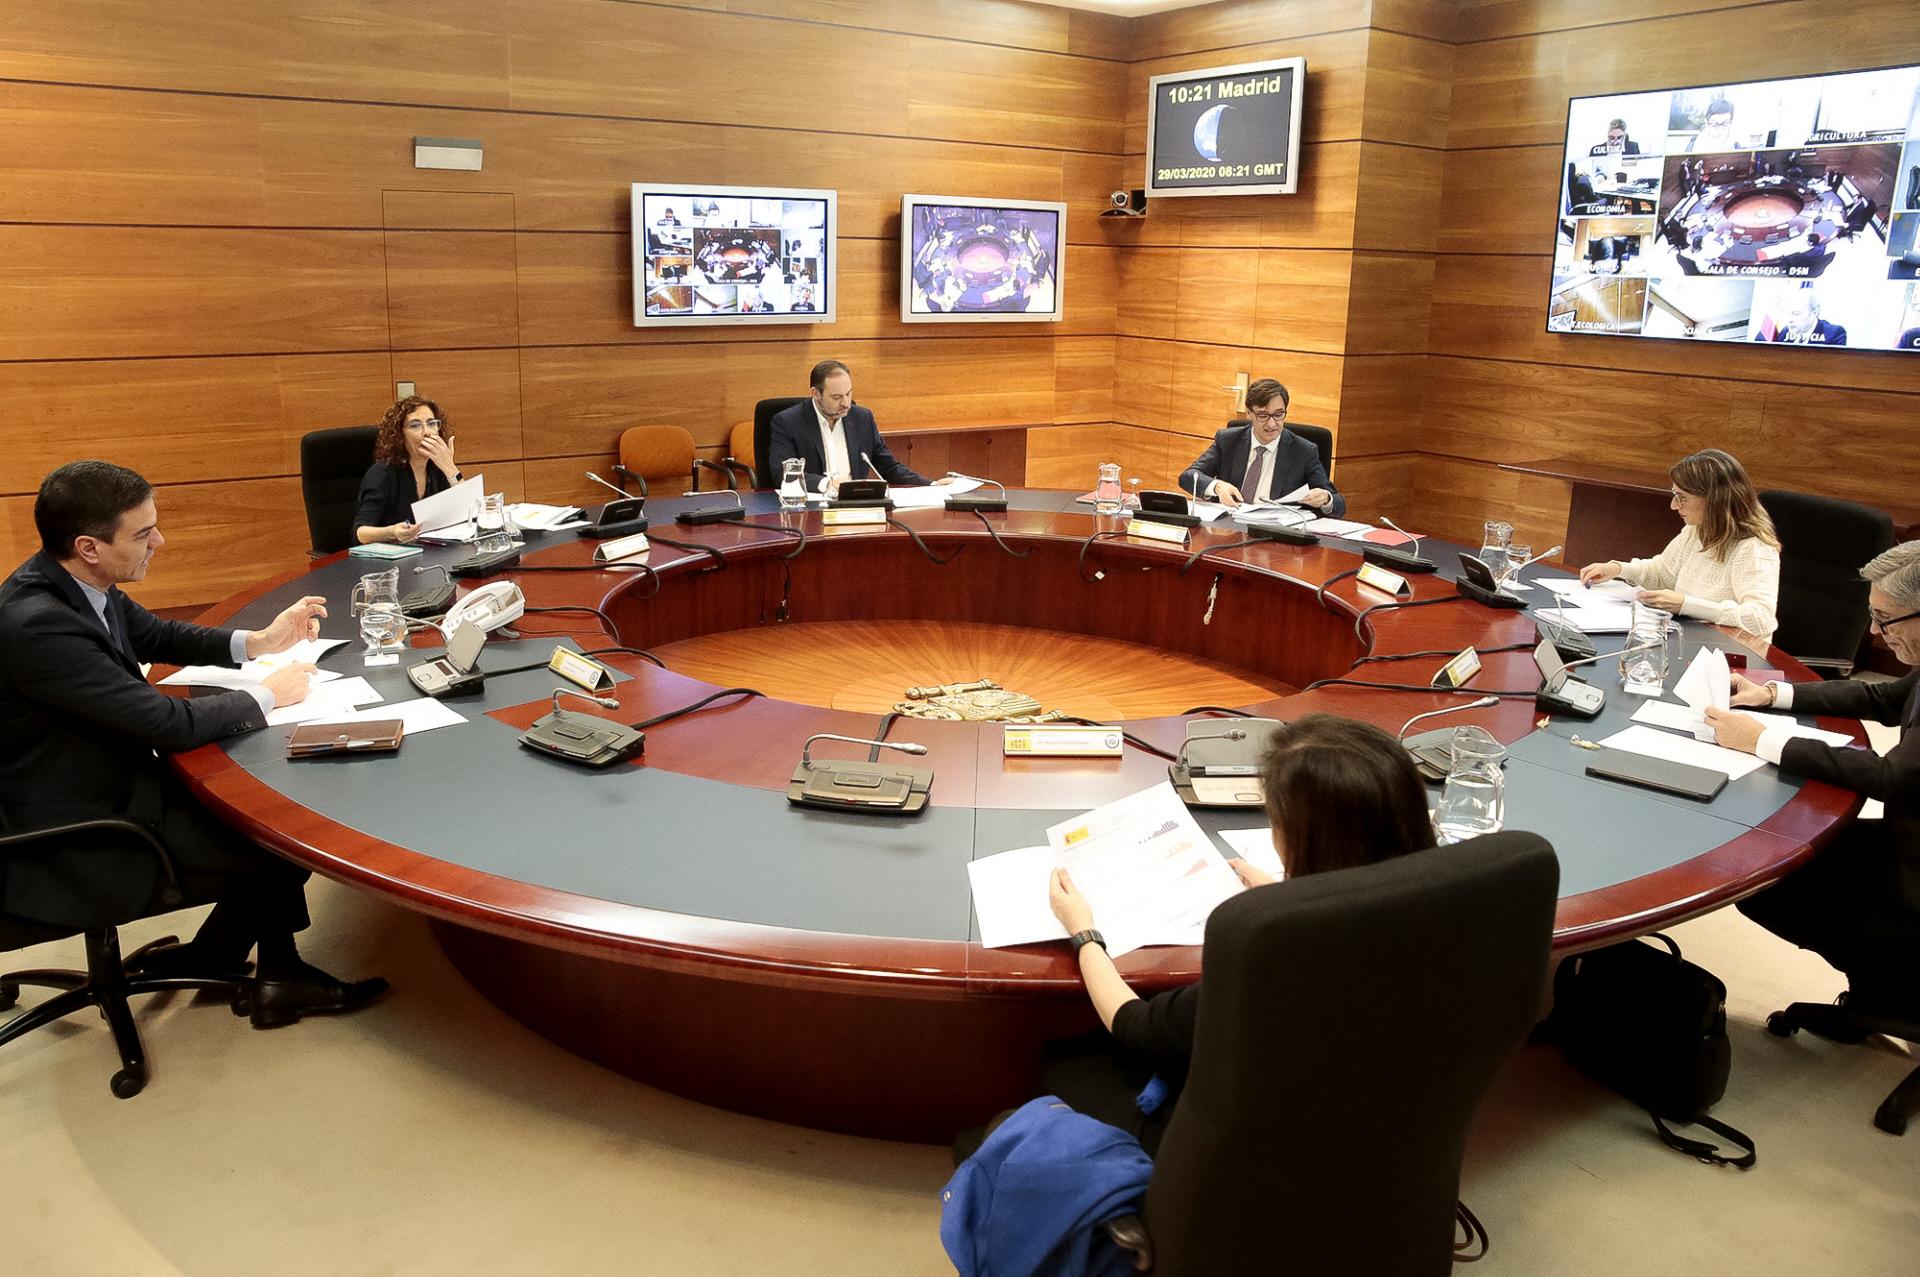 Reunión de algunos ministros en plena pandemia / Gtres